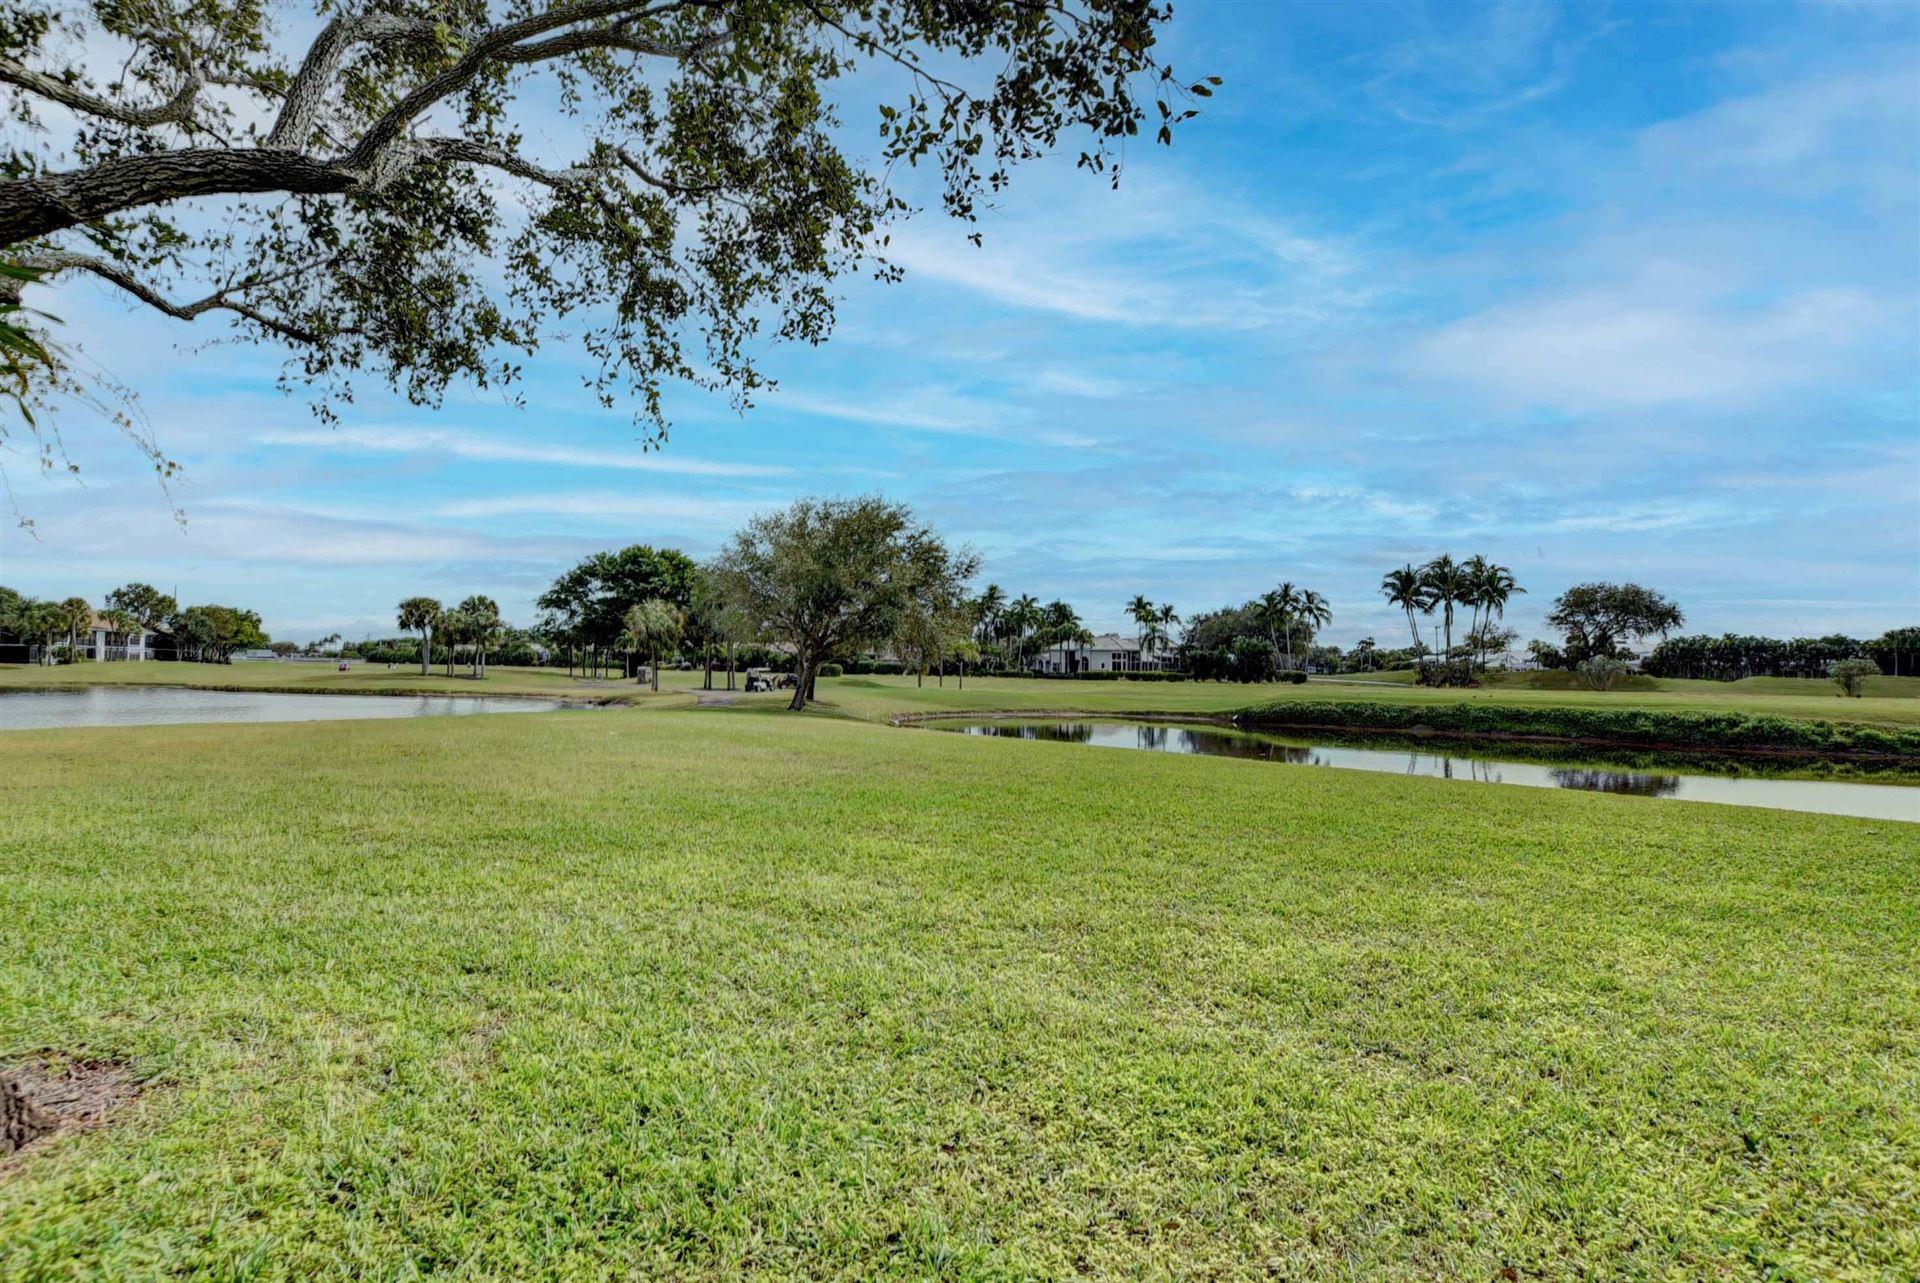 Photo of 5254 Fairway Woods Drive #3812, Delray Beach, FL 33484 (MLS # RX-10685796)